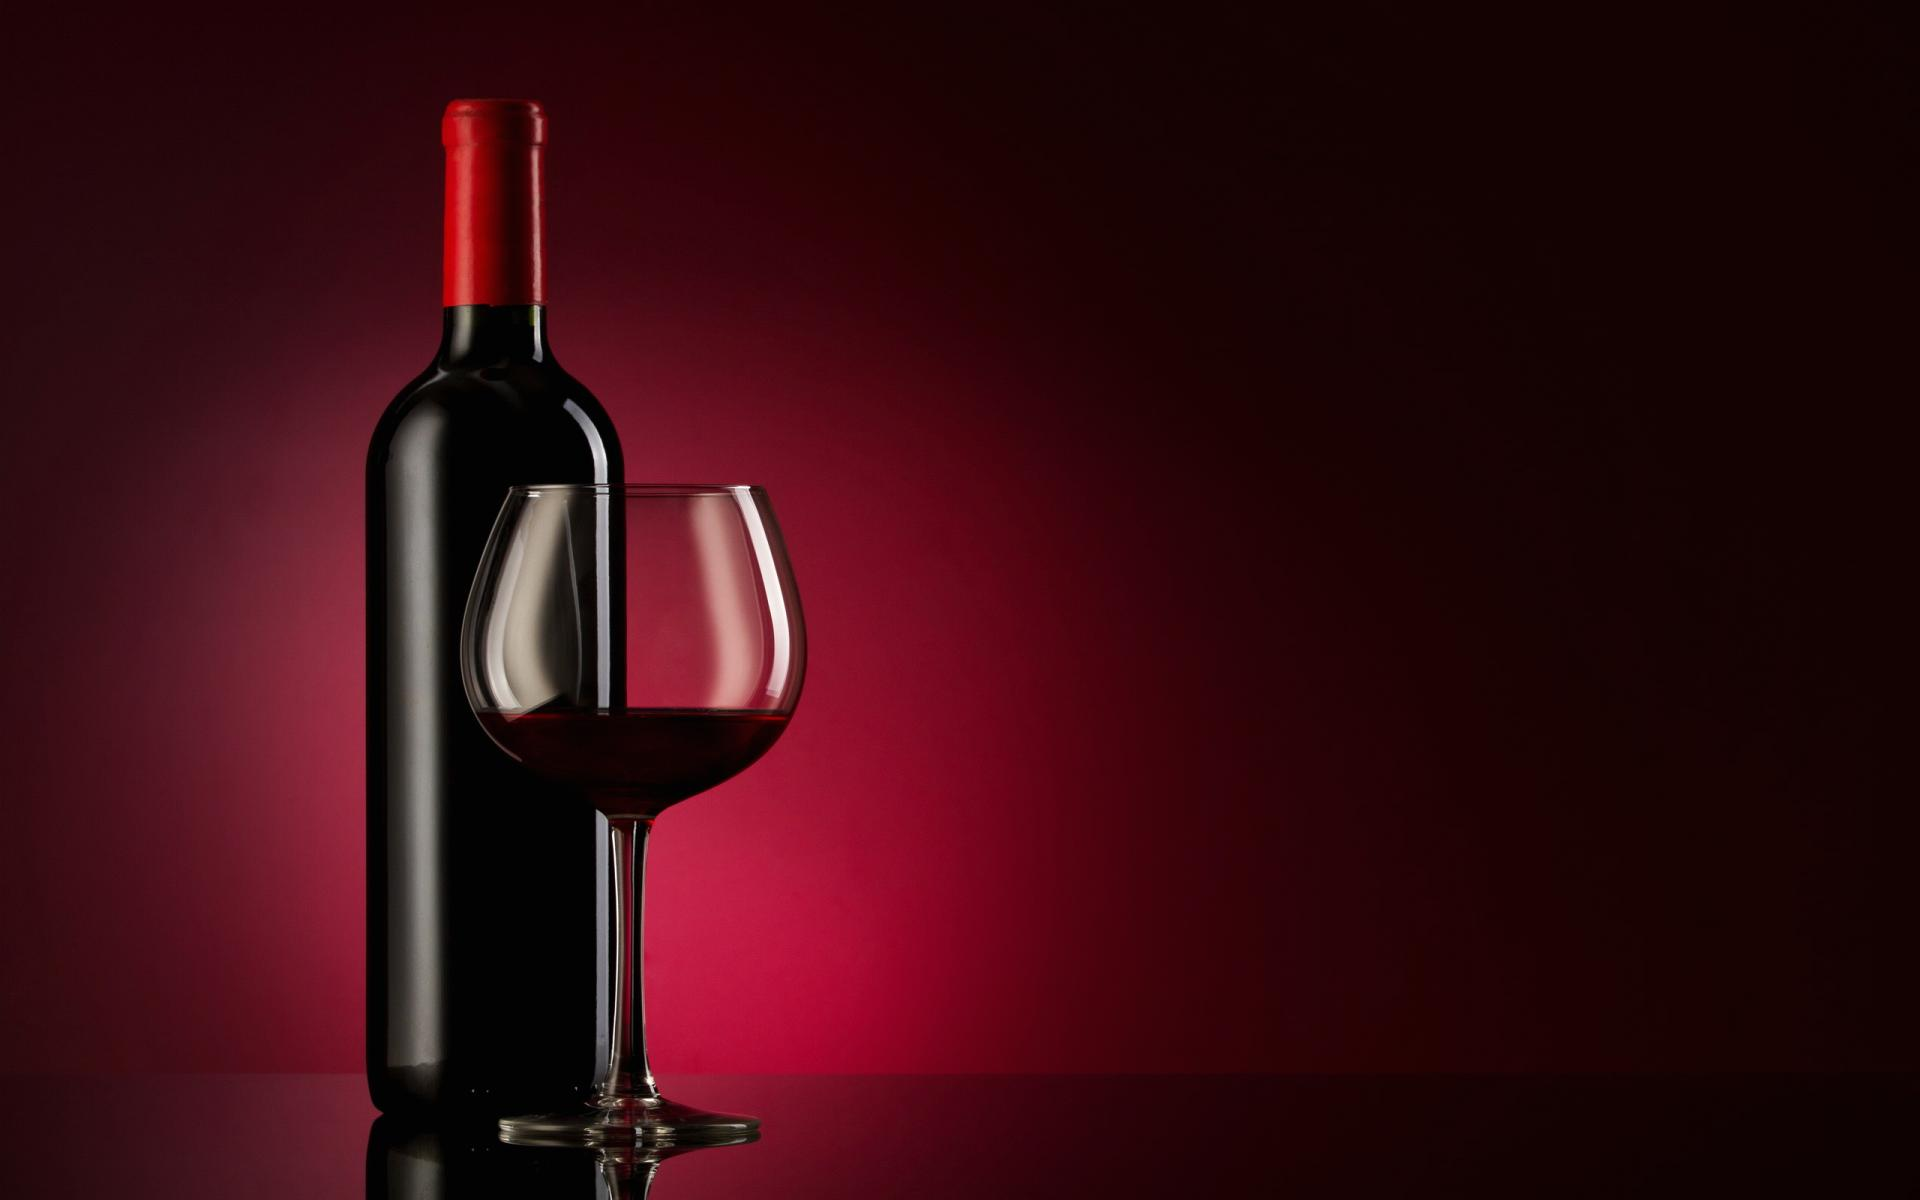 Bottle Of Red Wine Cake